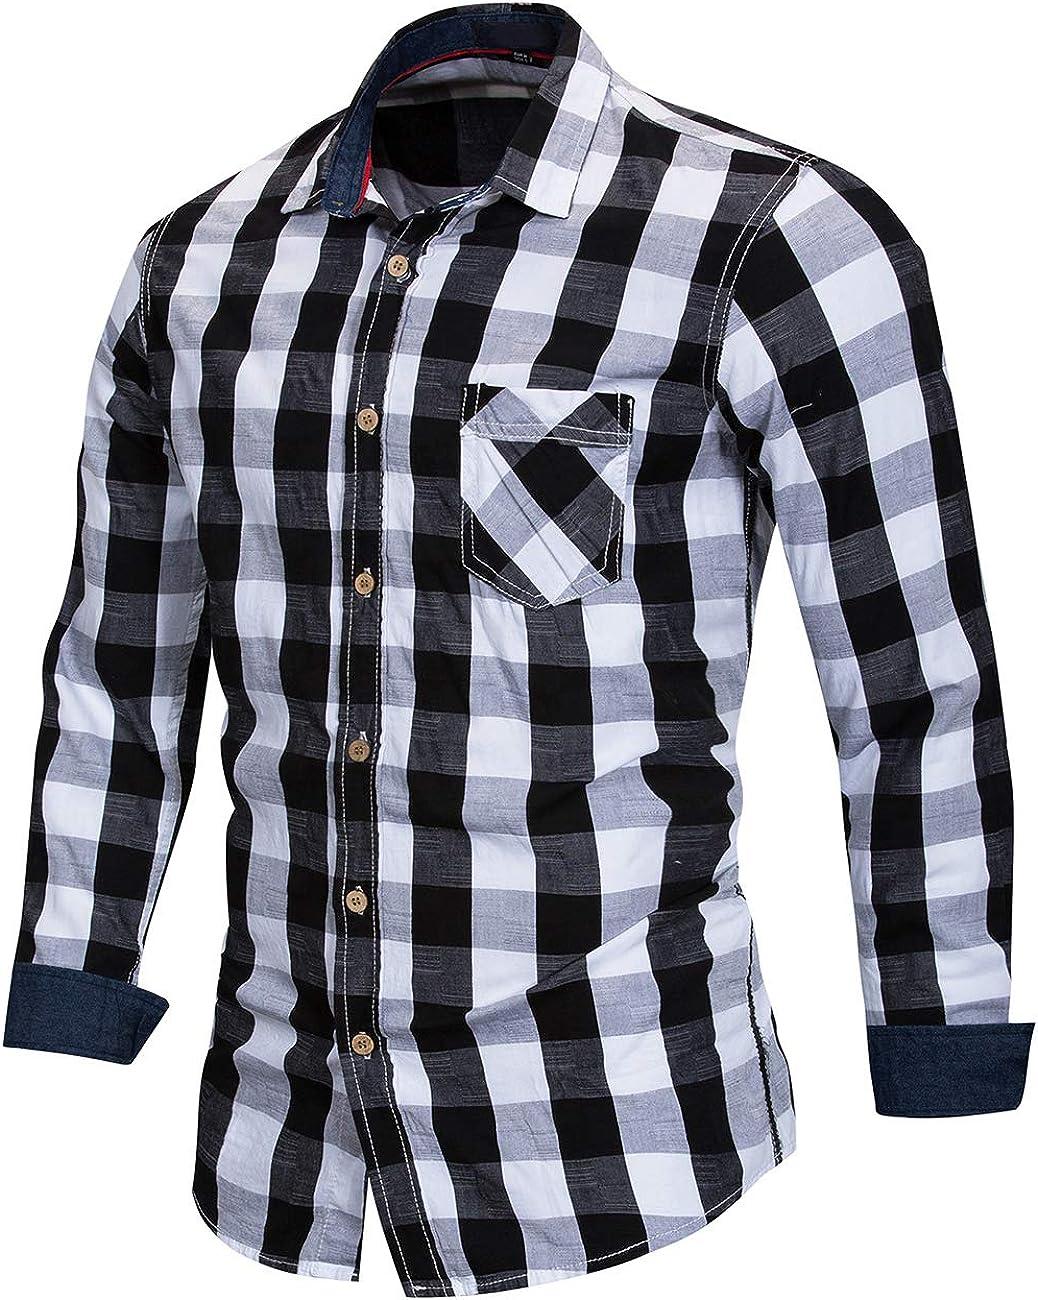 Pinkpum Mens Long Sleeve Checked Shirt Cotton Plaid Shirt Business Casual Dress British Stylish Classic Shirt Regular Fit Black-white